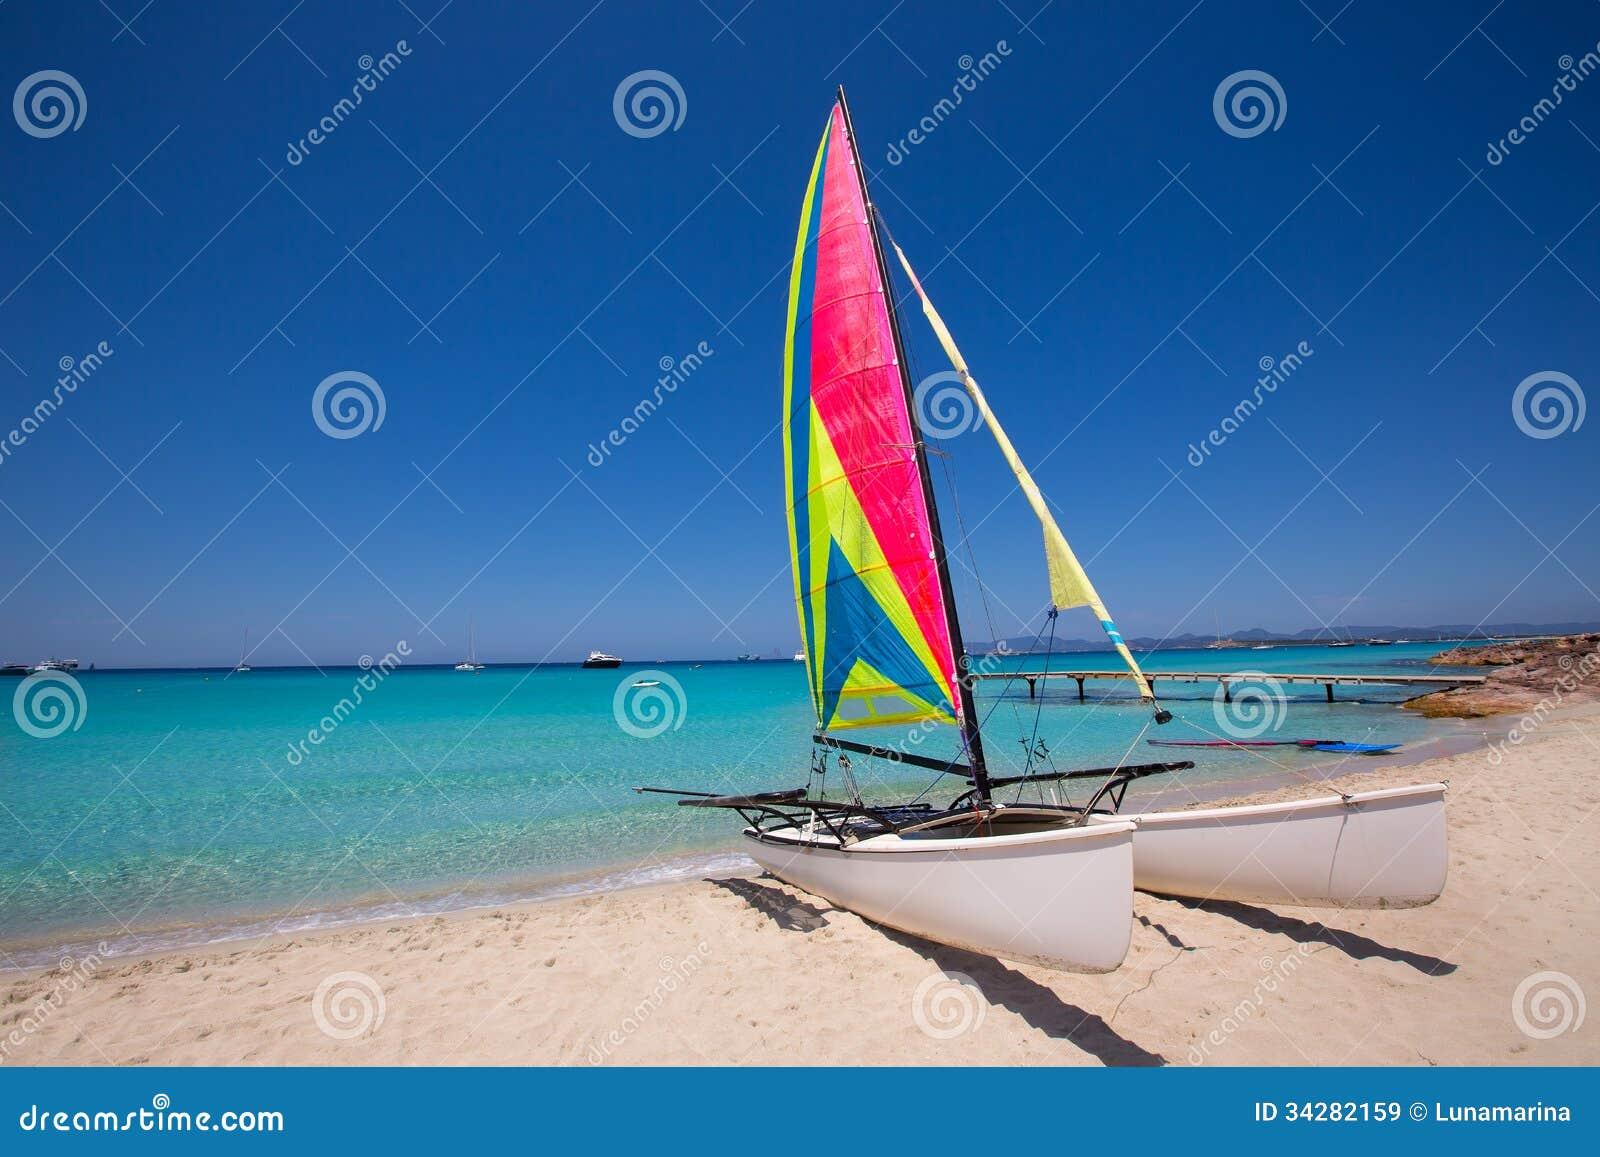 Catamaran Sailboat In Illetes Beach Of Formentera Royalty Free Stock Images - Image: 34282159